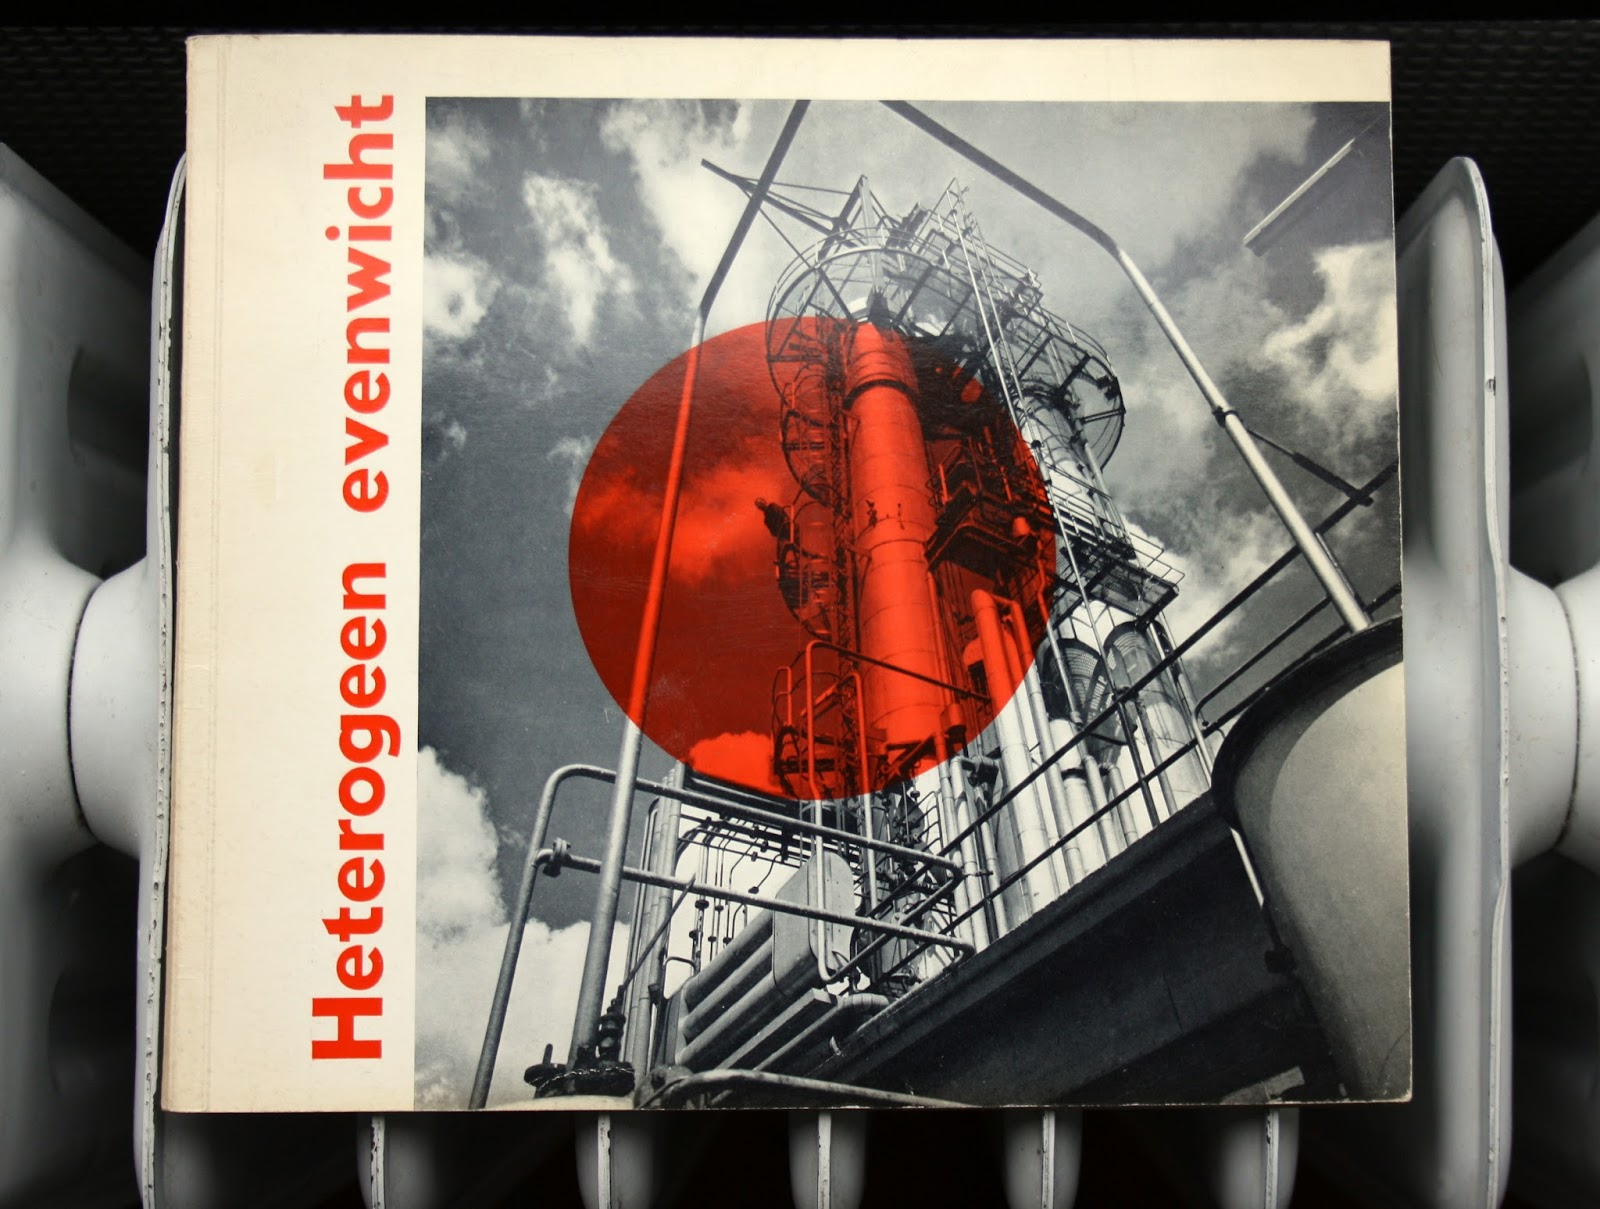 Heterogeneous Equilibrium Modernism Graphic Design B Mol Cas Oorthuys 1 100 Dutch Photographic